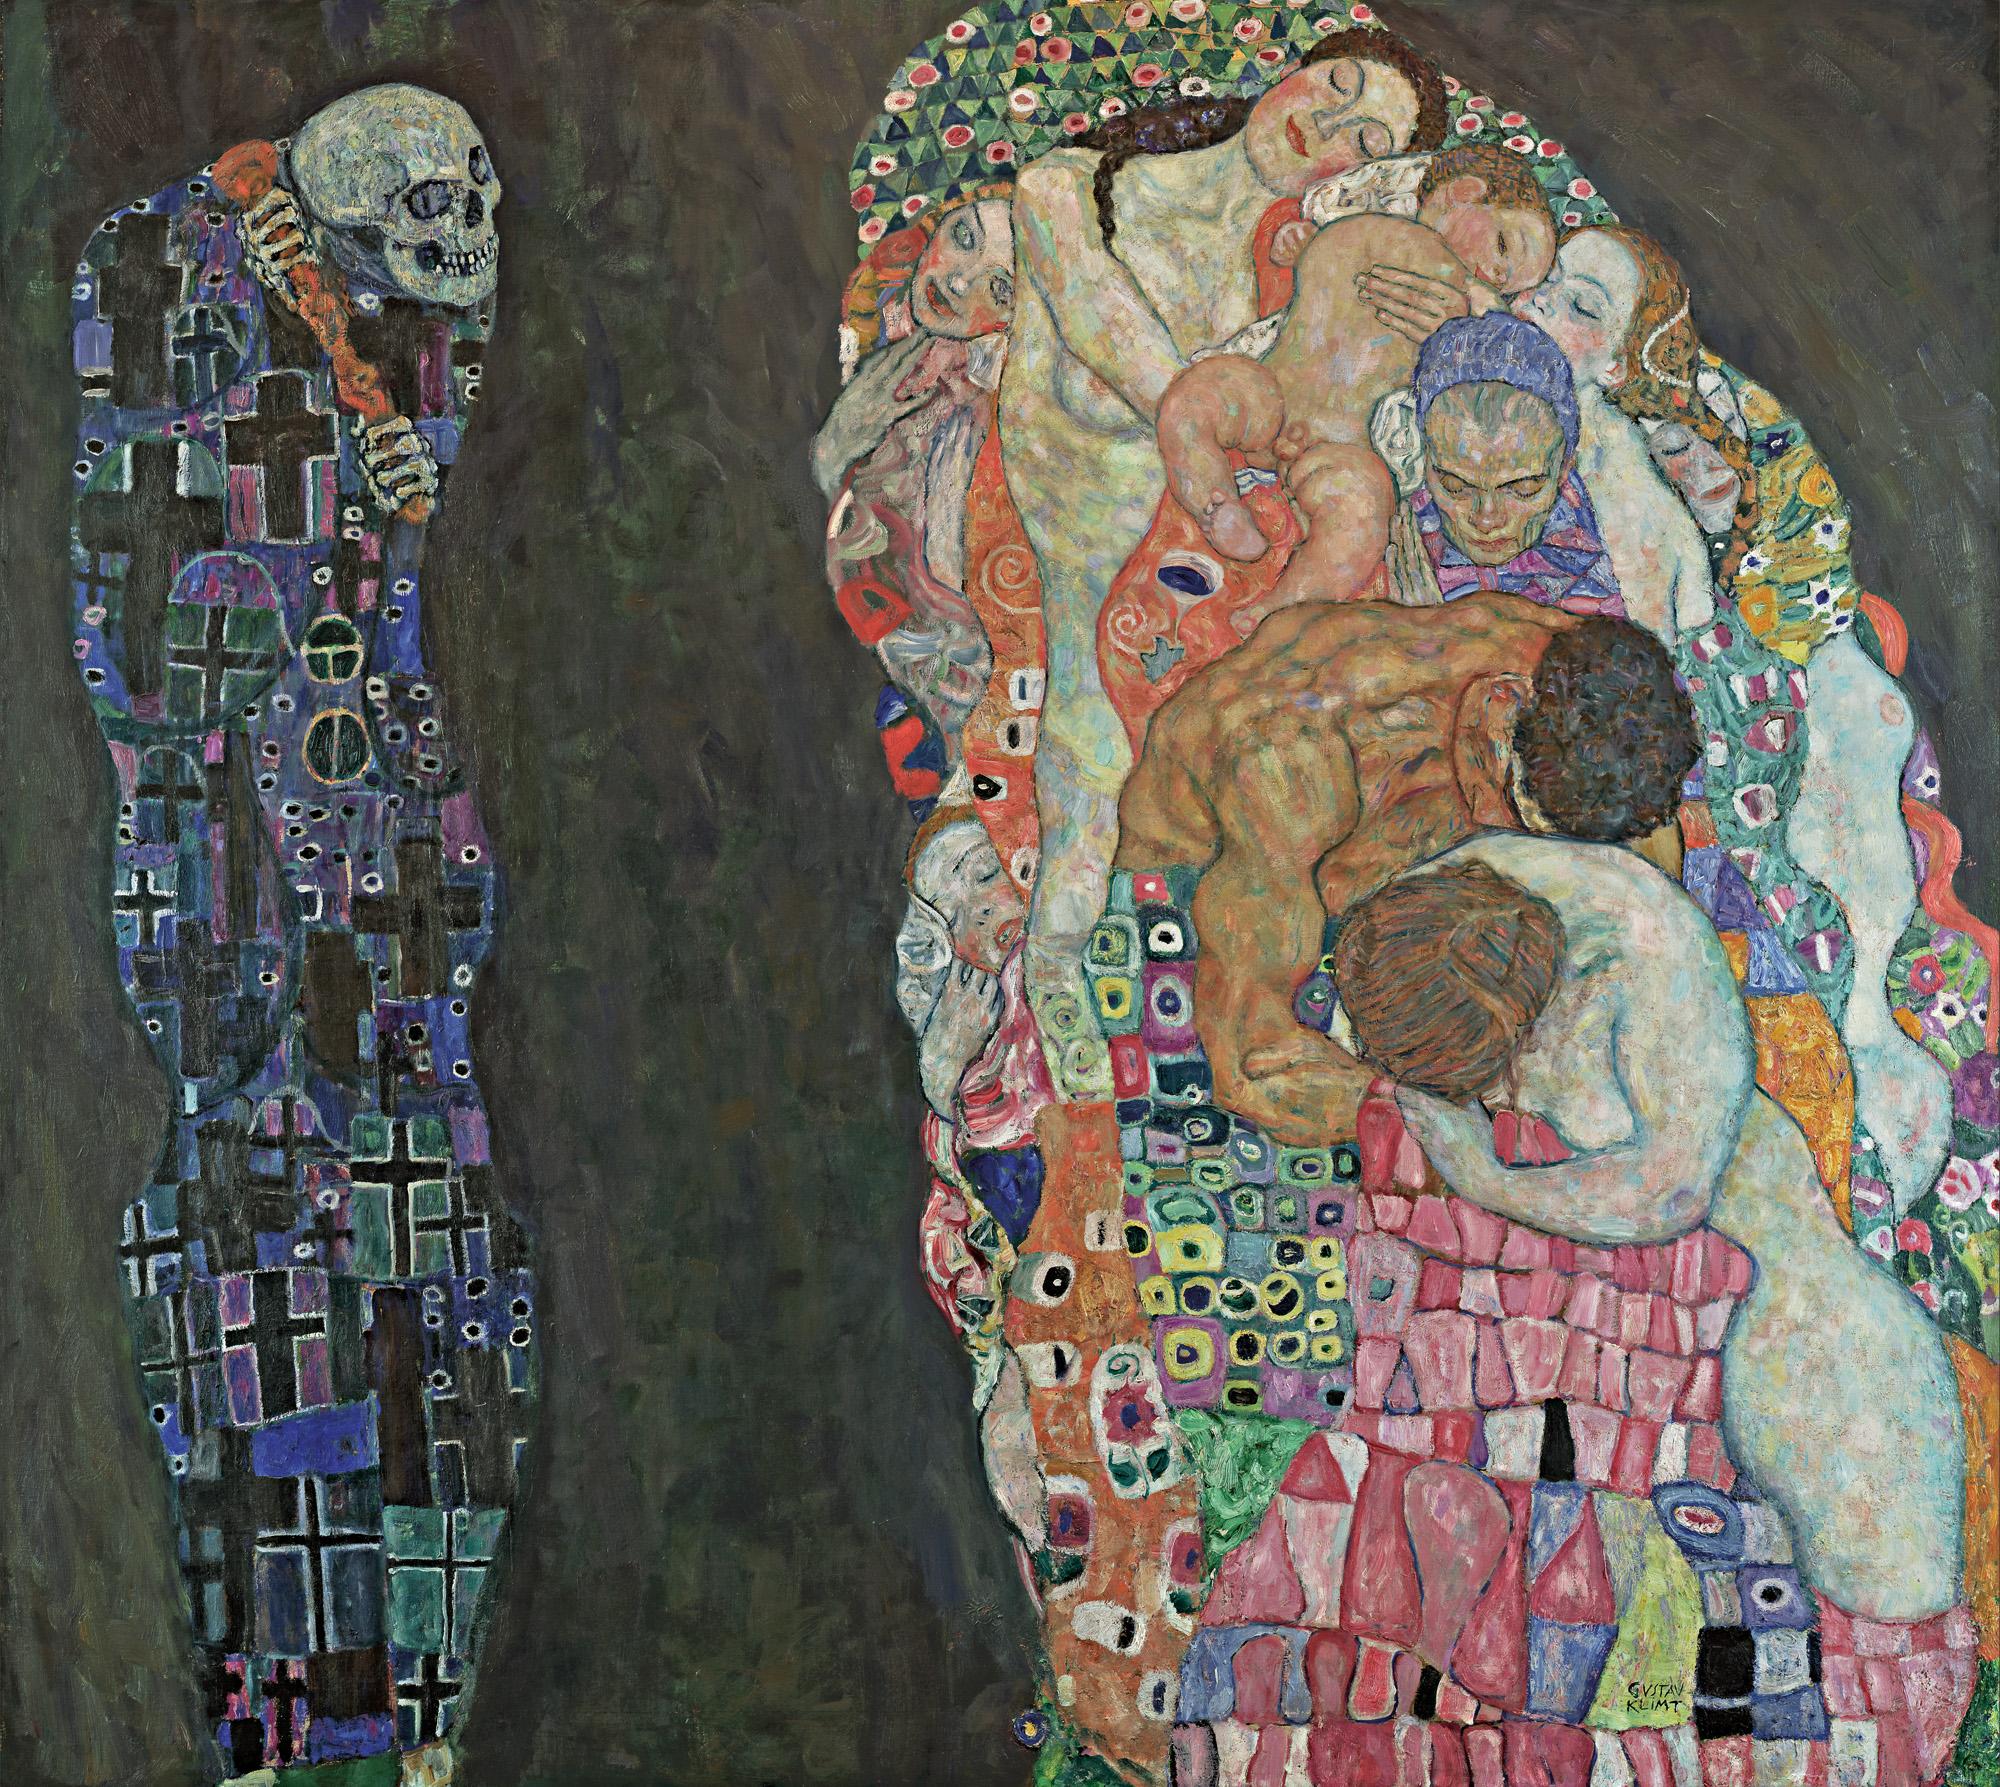 Gustav Klimt & Egon Schiele埃贡·席勒与导师古斯塔夫·克林姆特1